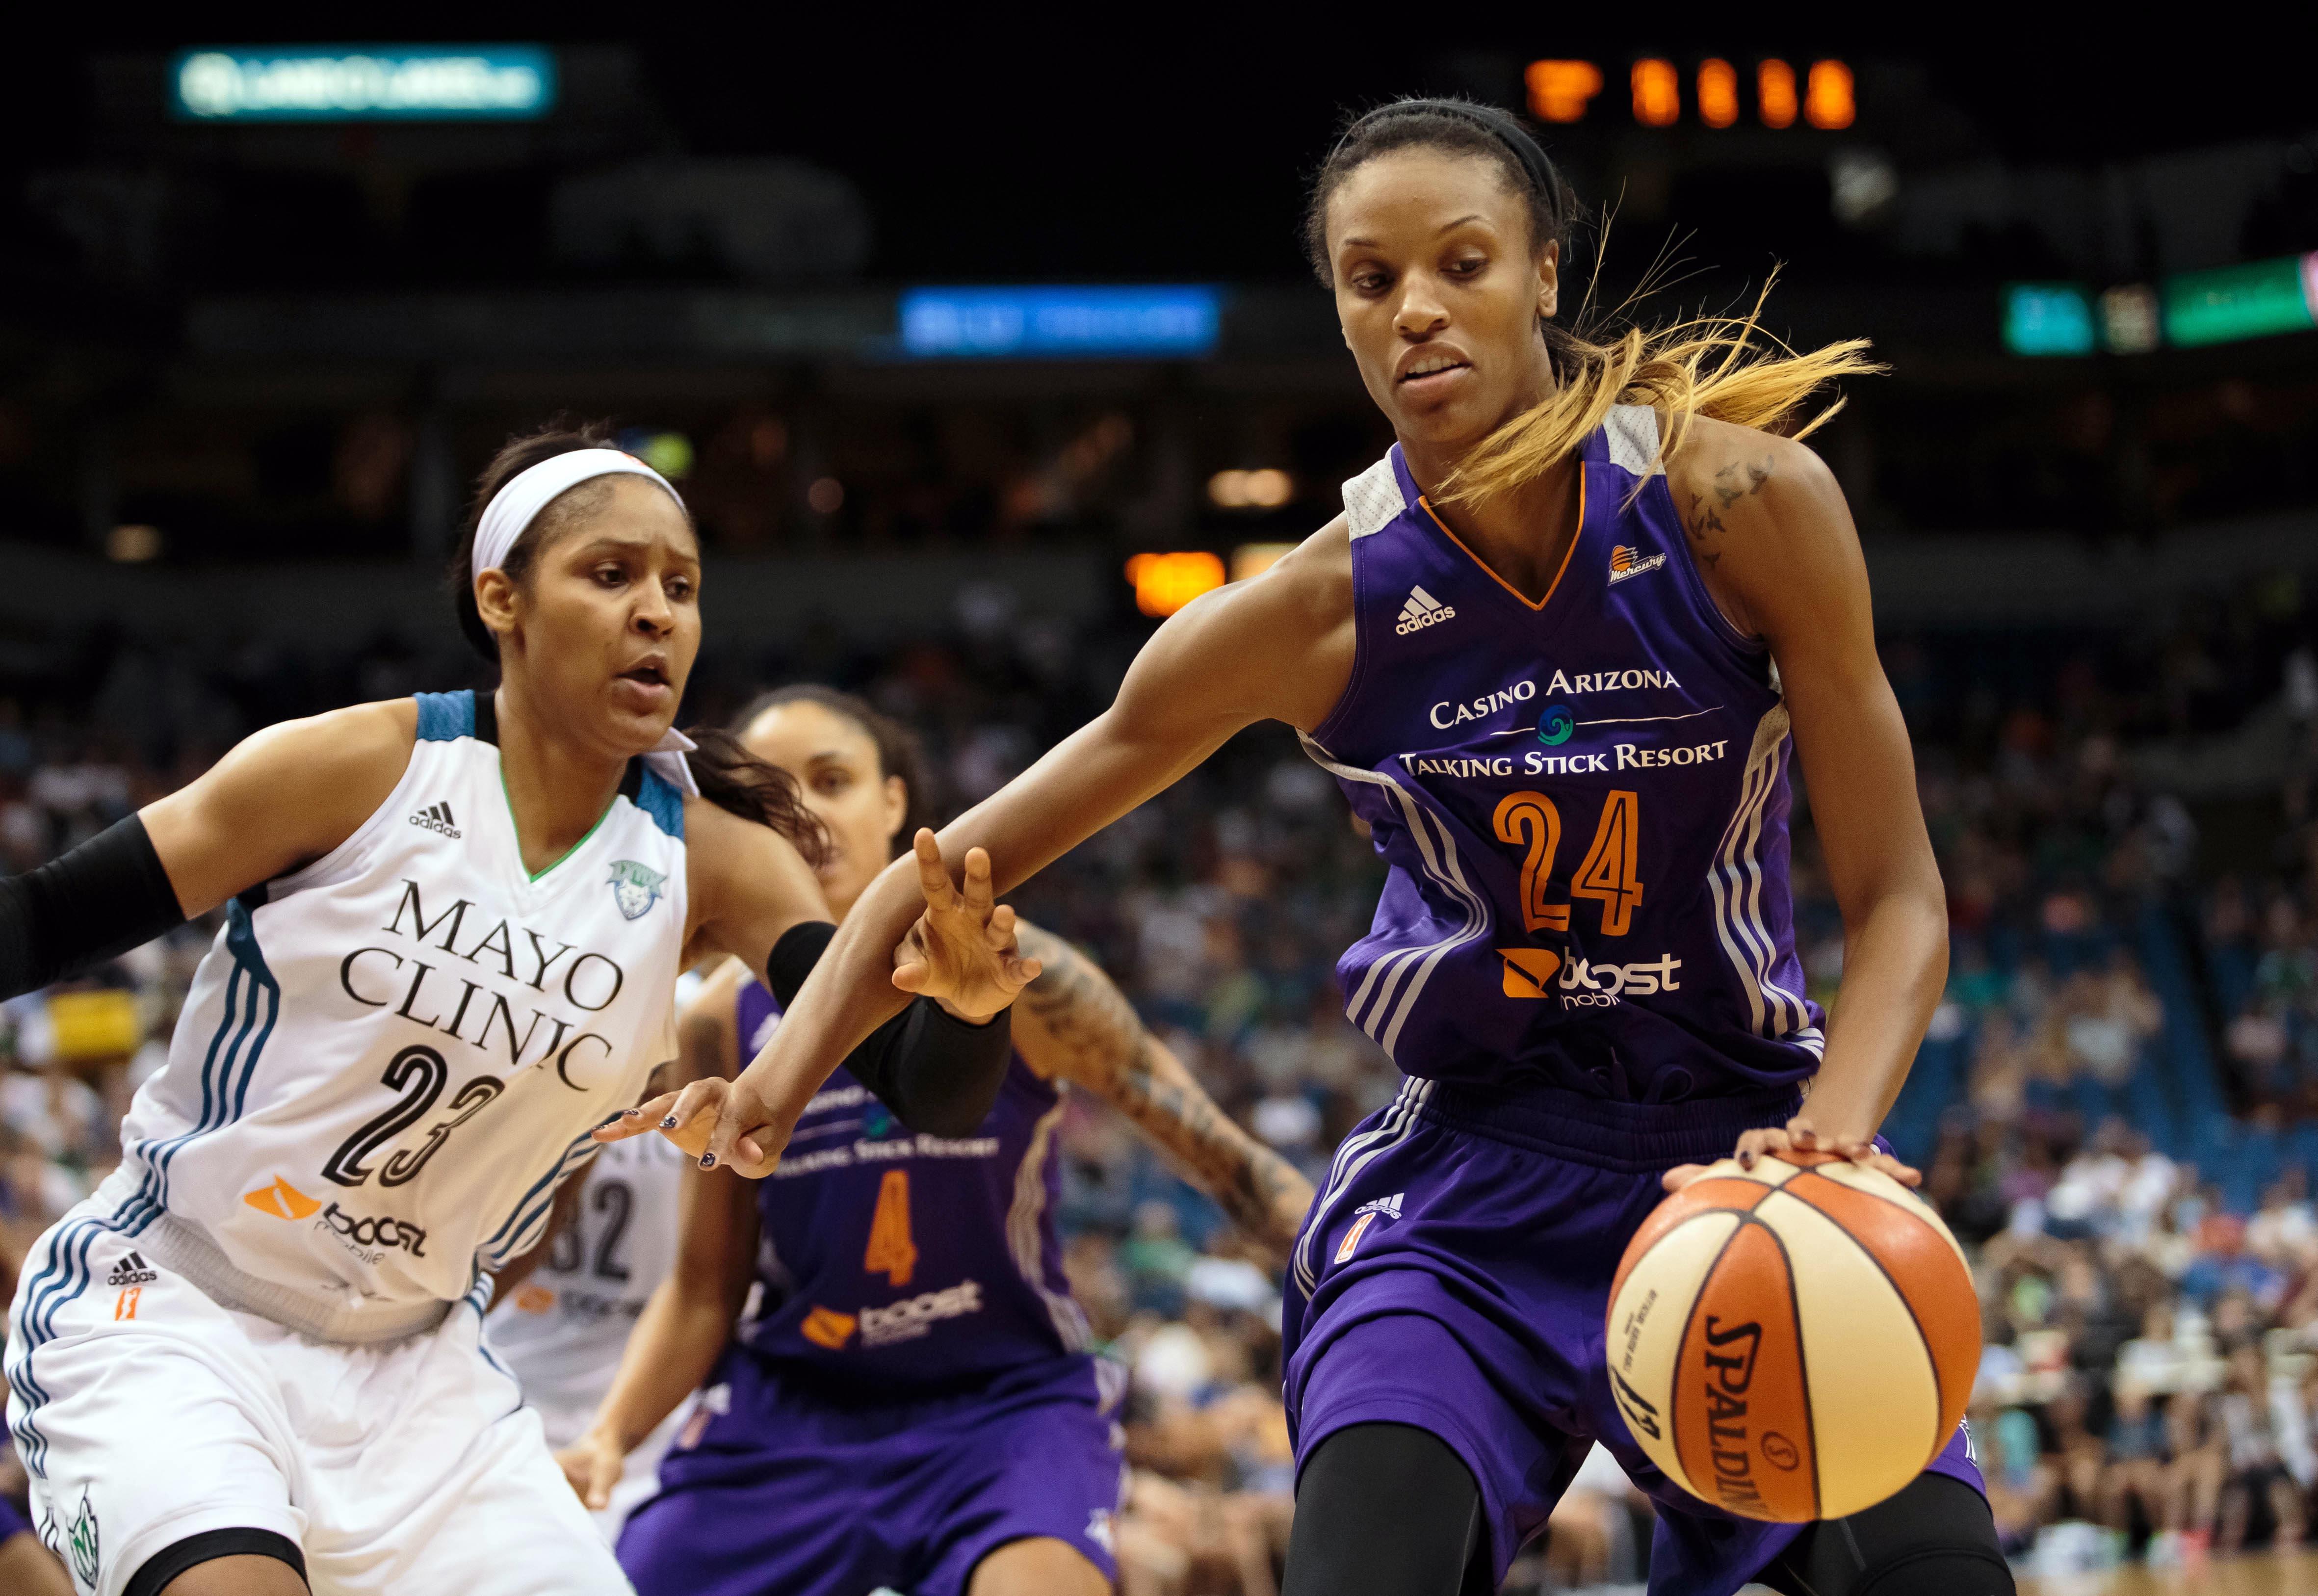 WNBA: Phoenix Mercury at Minnesota Lynx